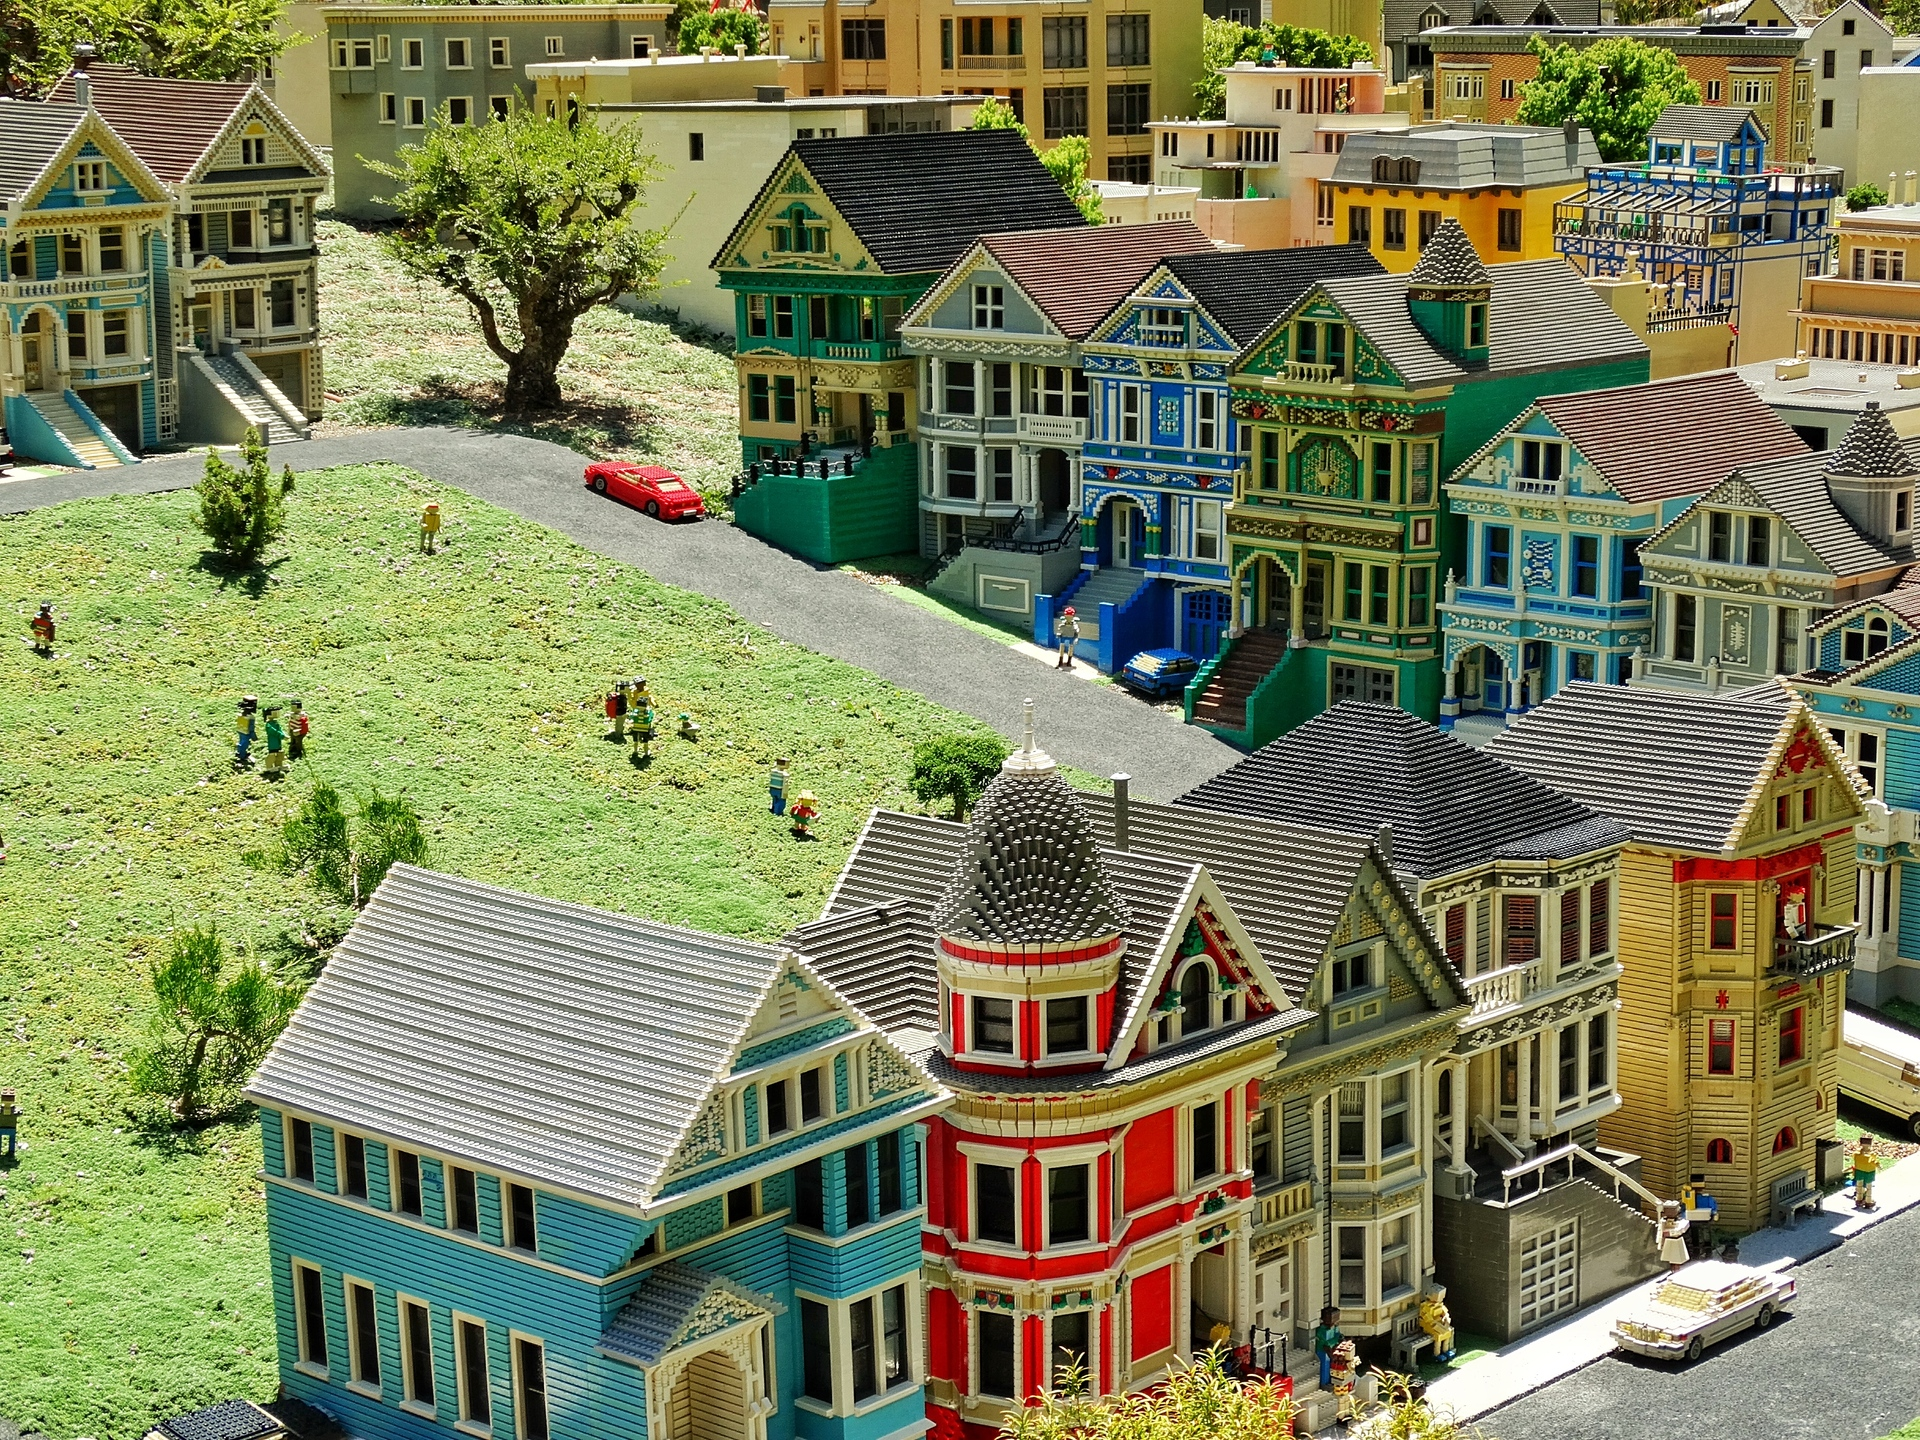 San Francisco Marina District. Lego Diorama Of San Francisco Marina District